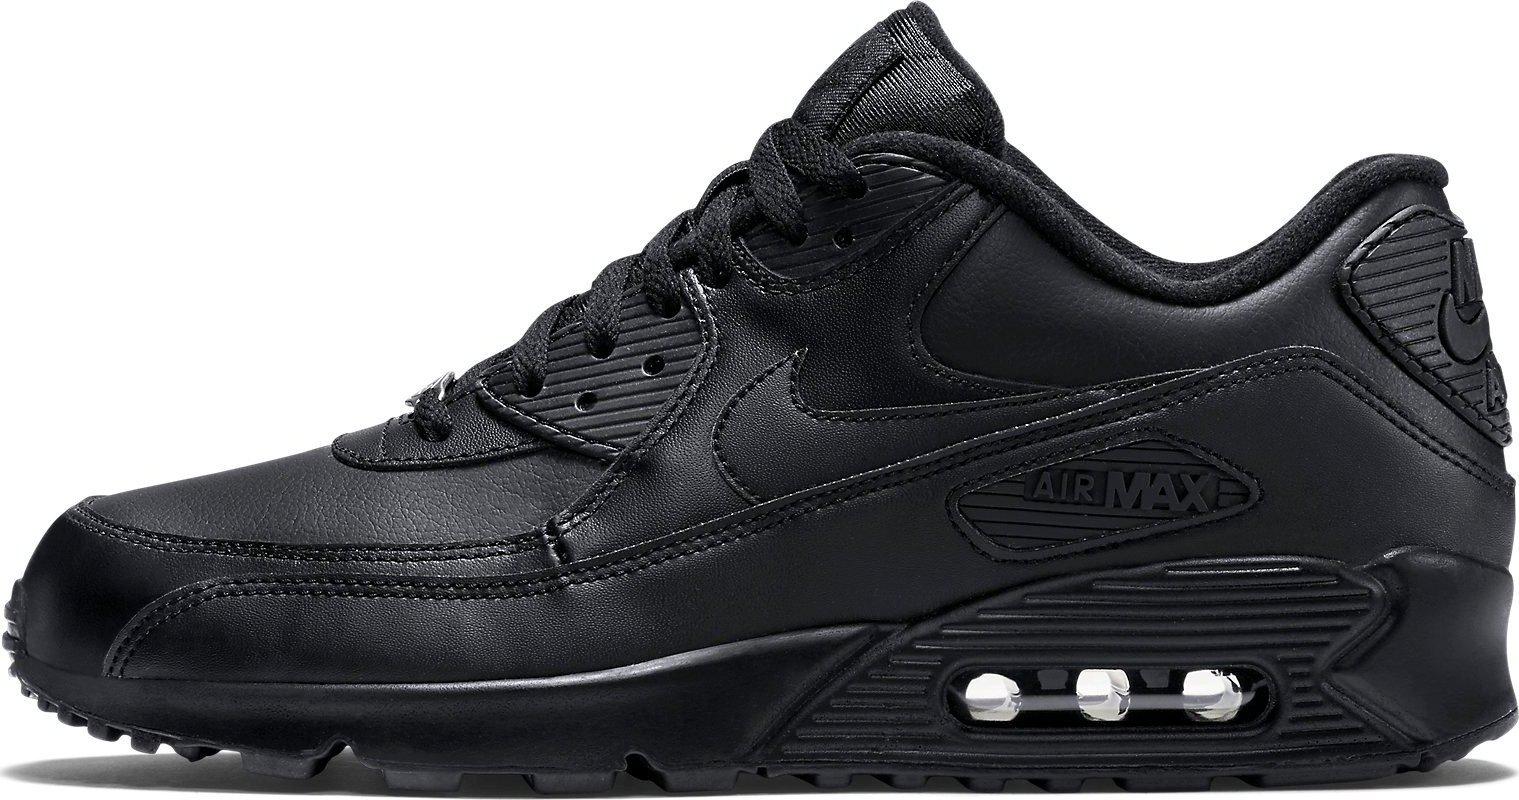 NIKE Air Max 90 Leather Black od 2 433 Kč • Zboží.cz 1790c72b83